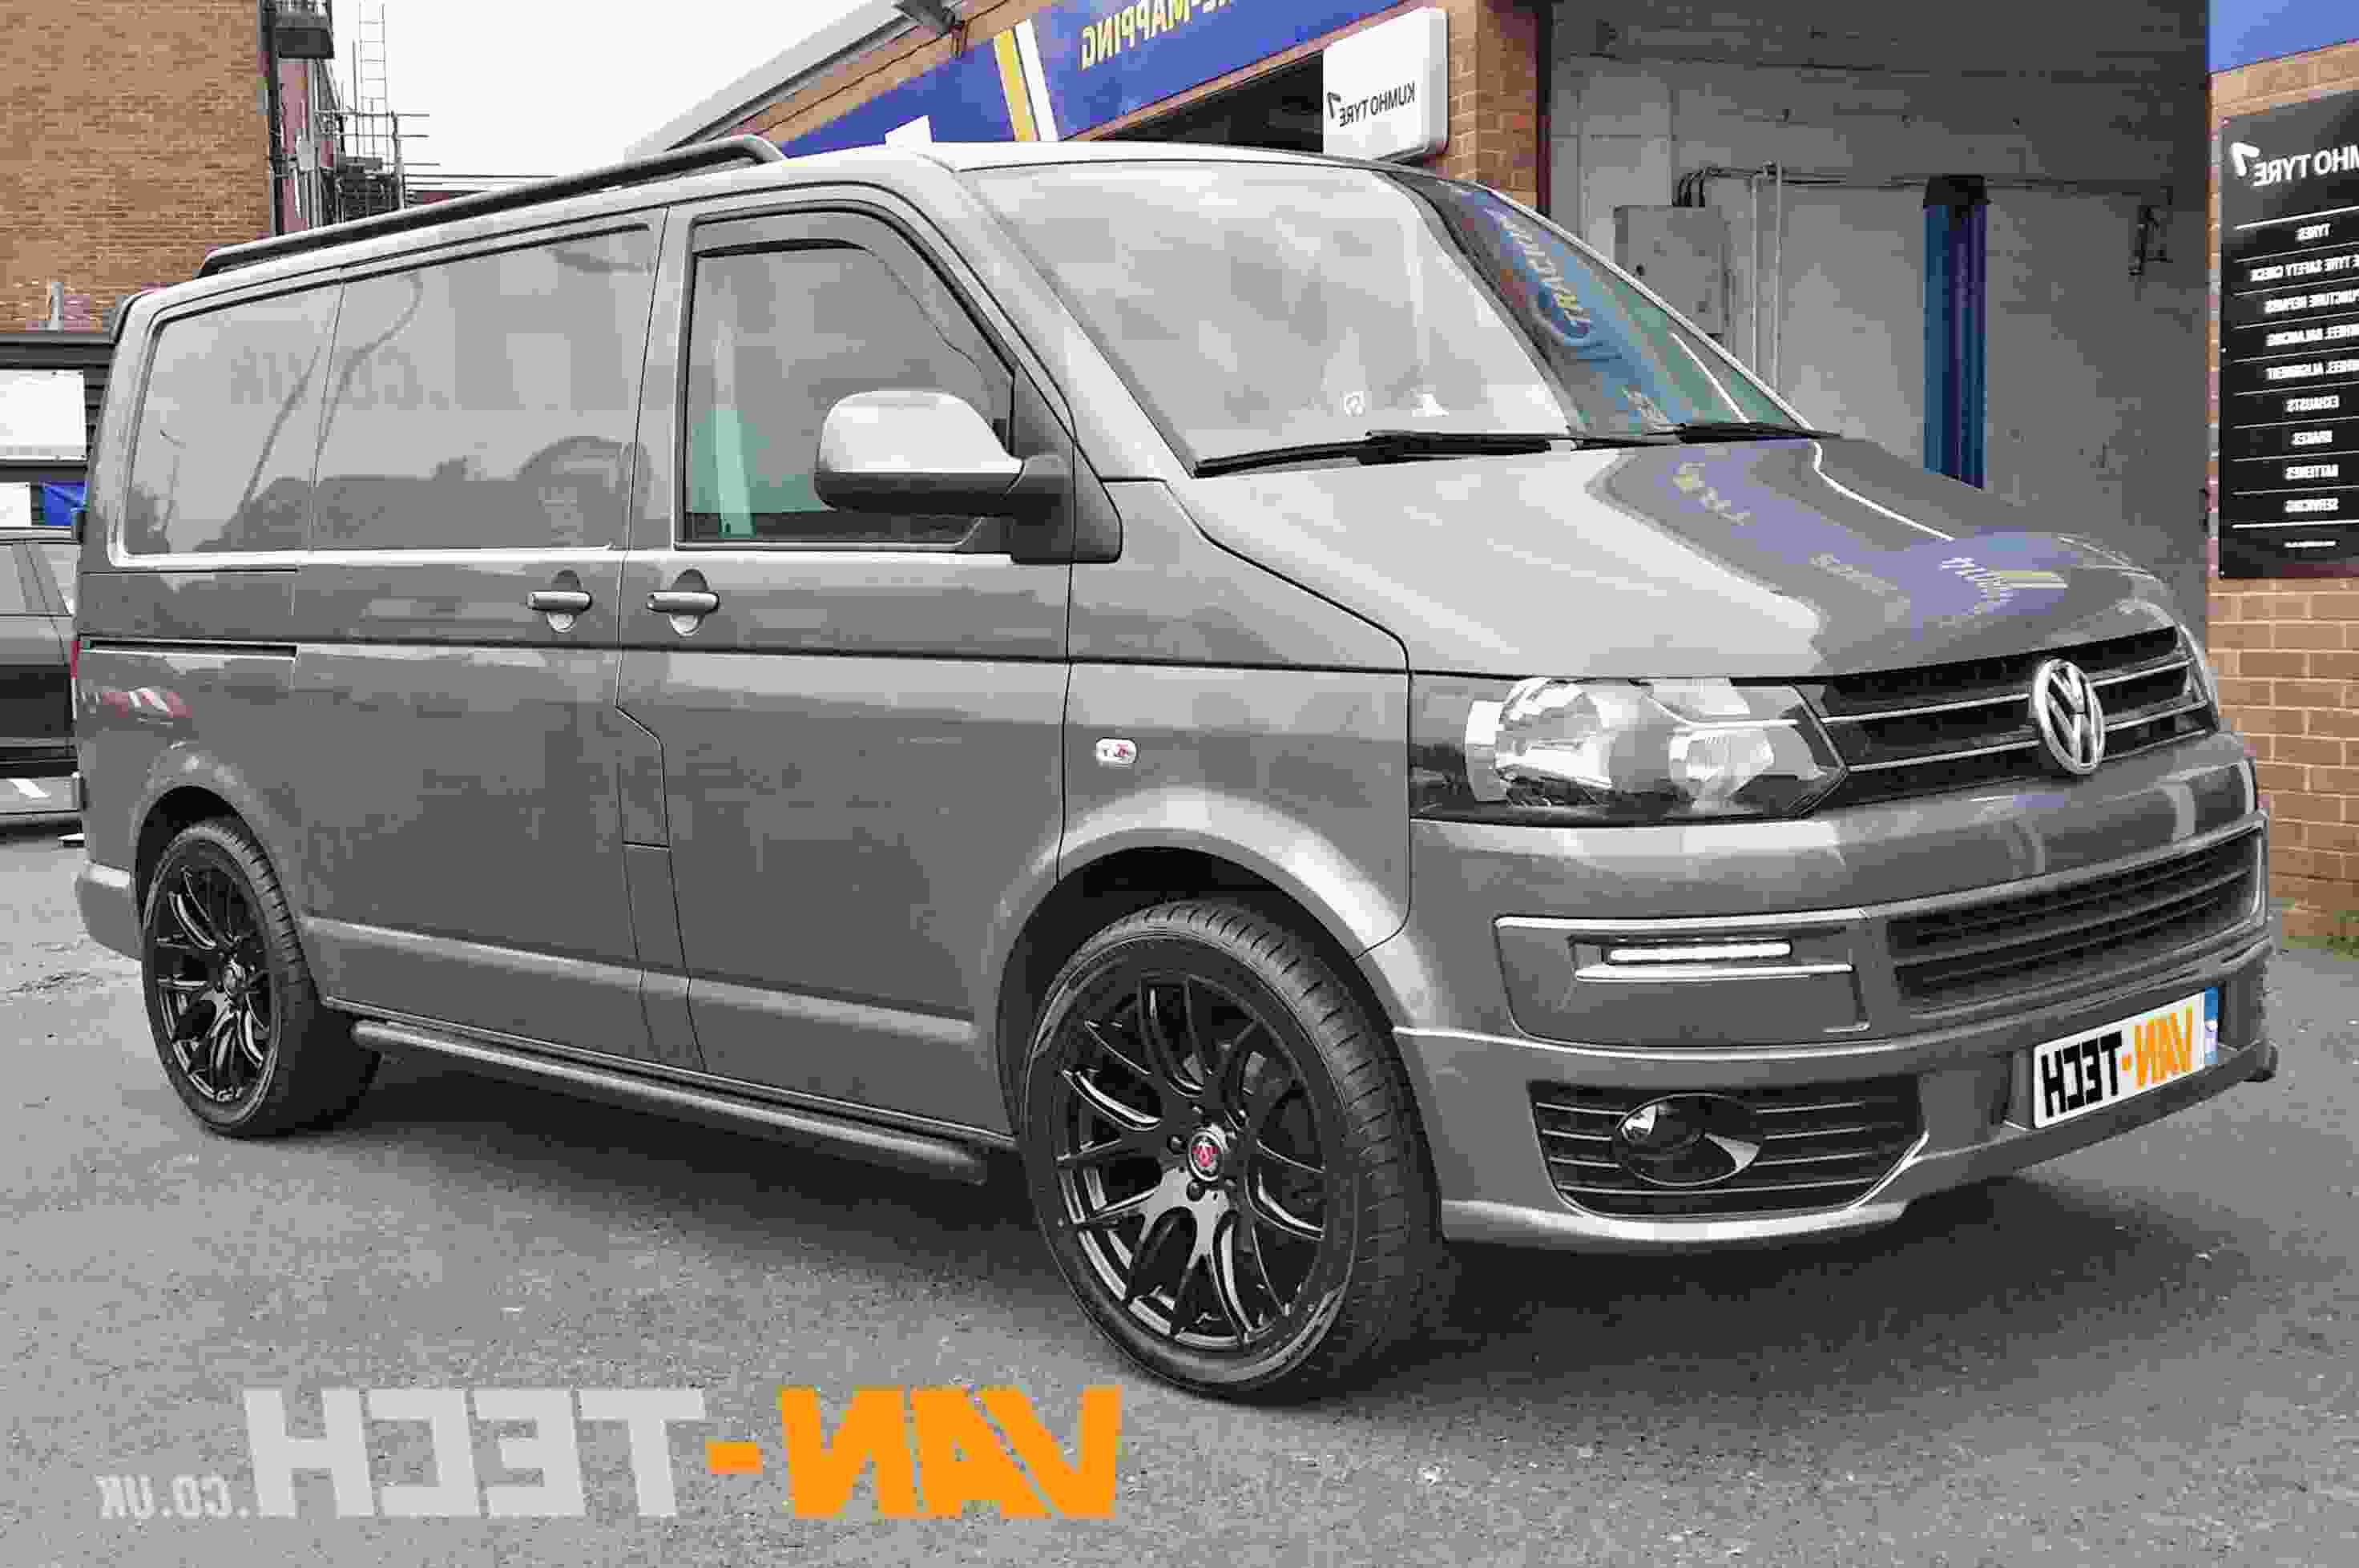 vw transporter t5 wheels 20 for sale